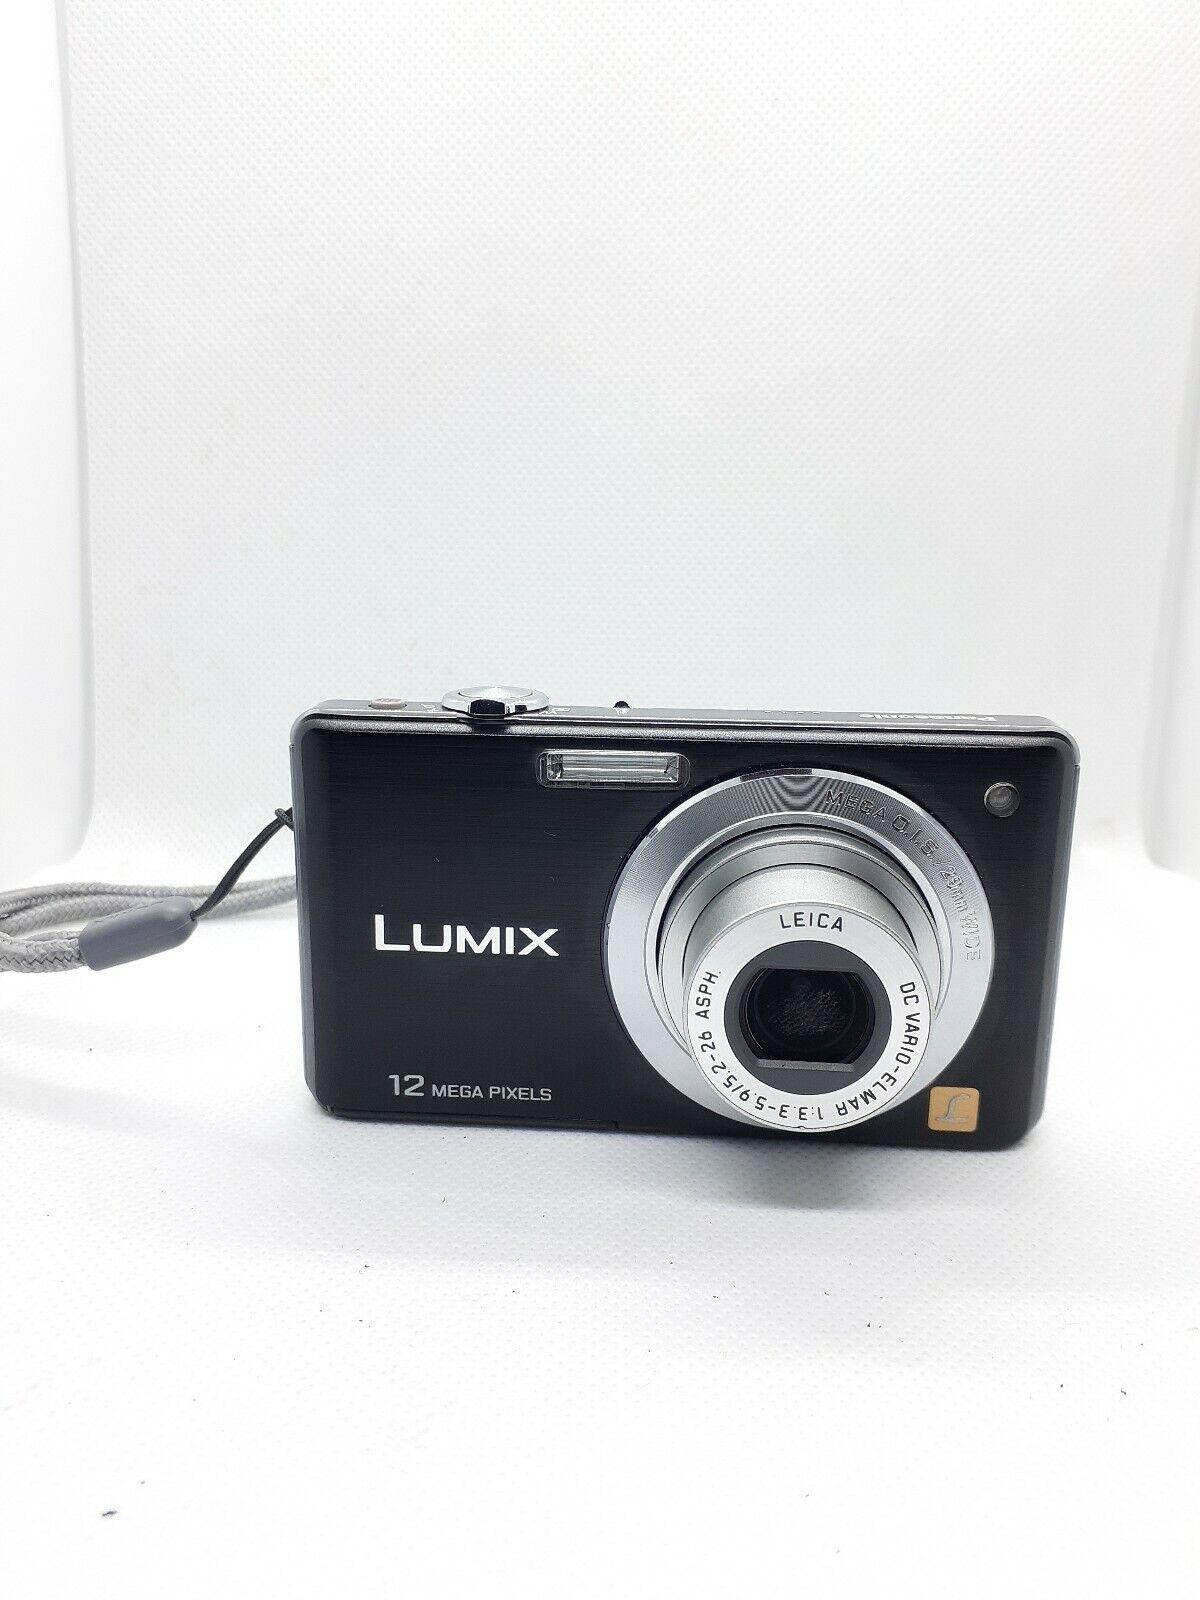 SDHC 2 Pack Panasonic Lumix DMC-FS15 Digital Camera Memory Card 2 x 8GB Secure Digital High Capacity Memory Cards